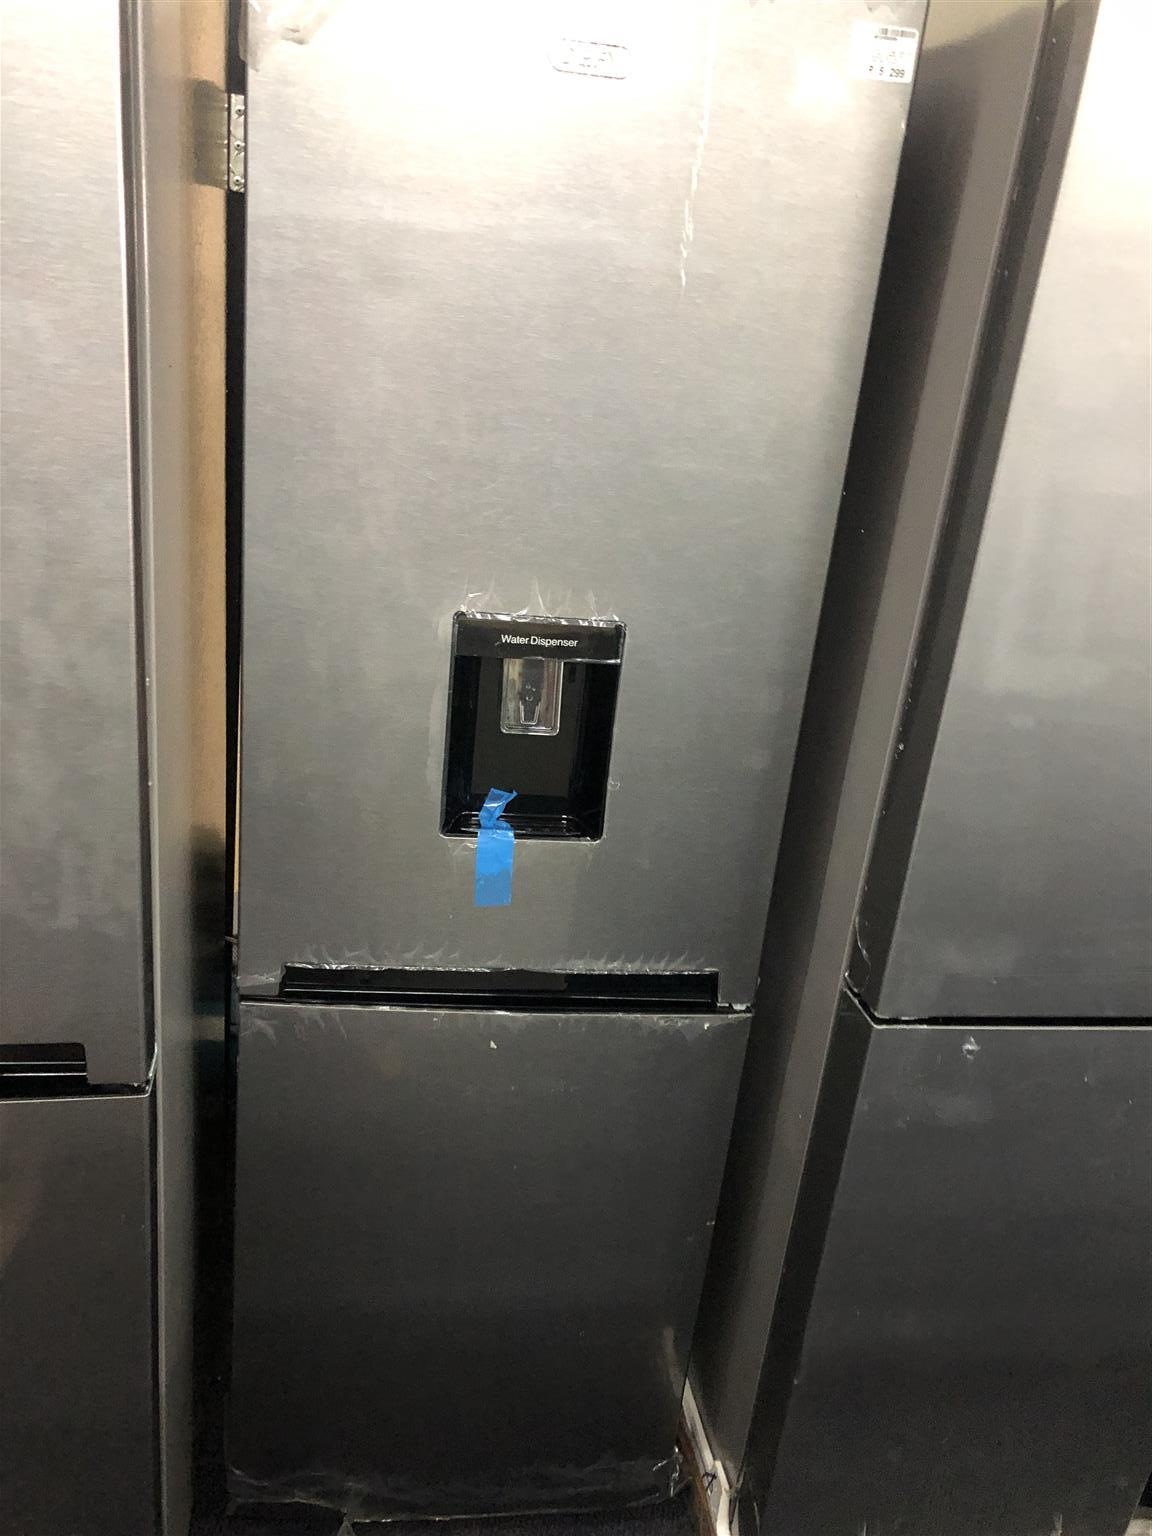 Fridge / Freezer Defy with Water Dispenser